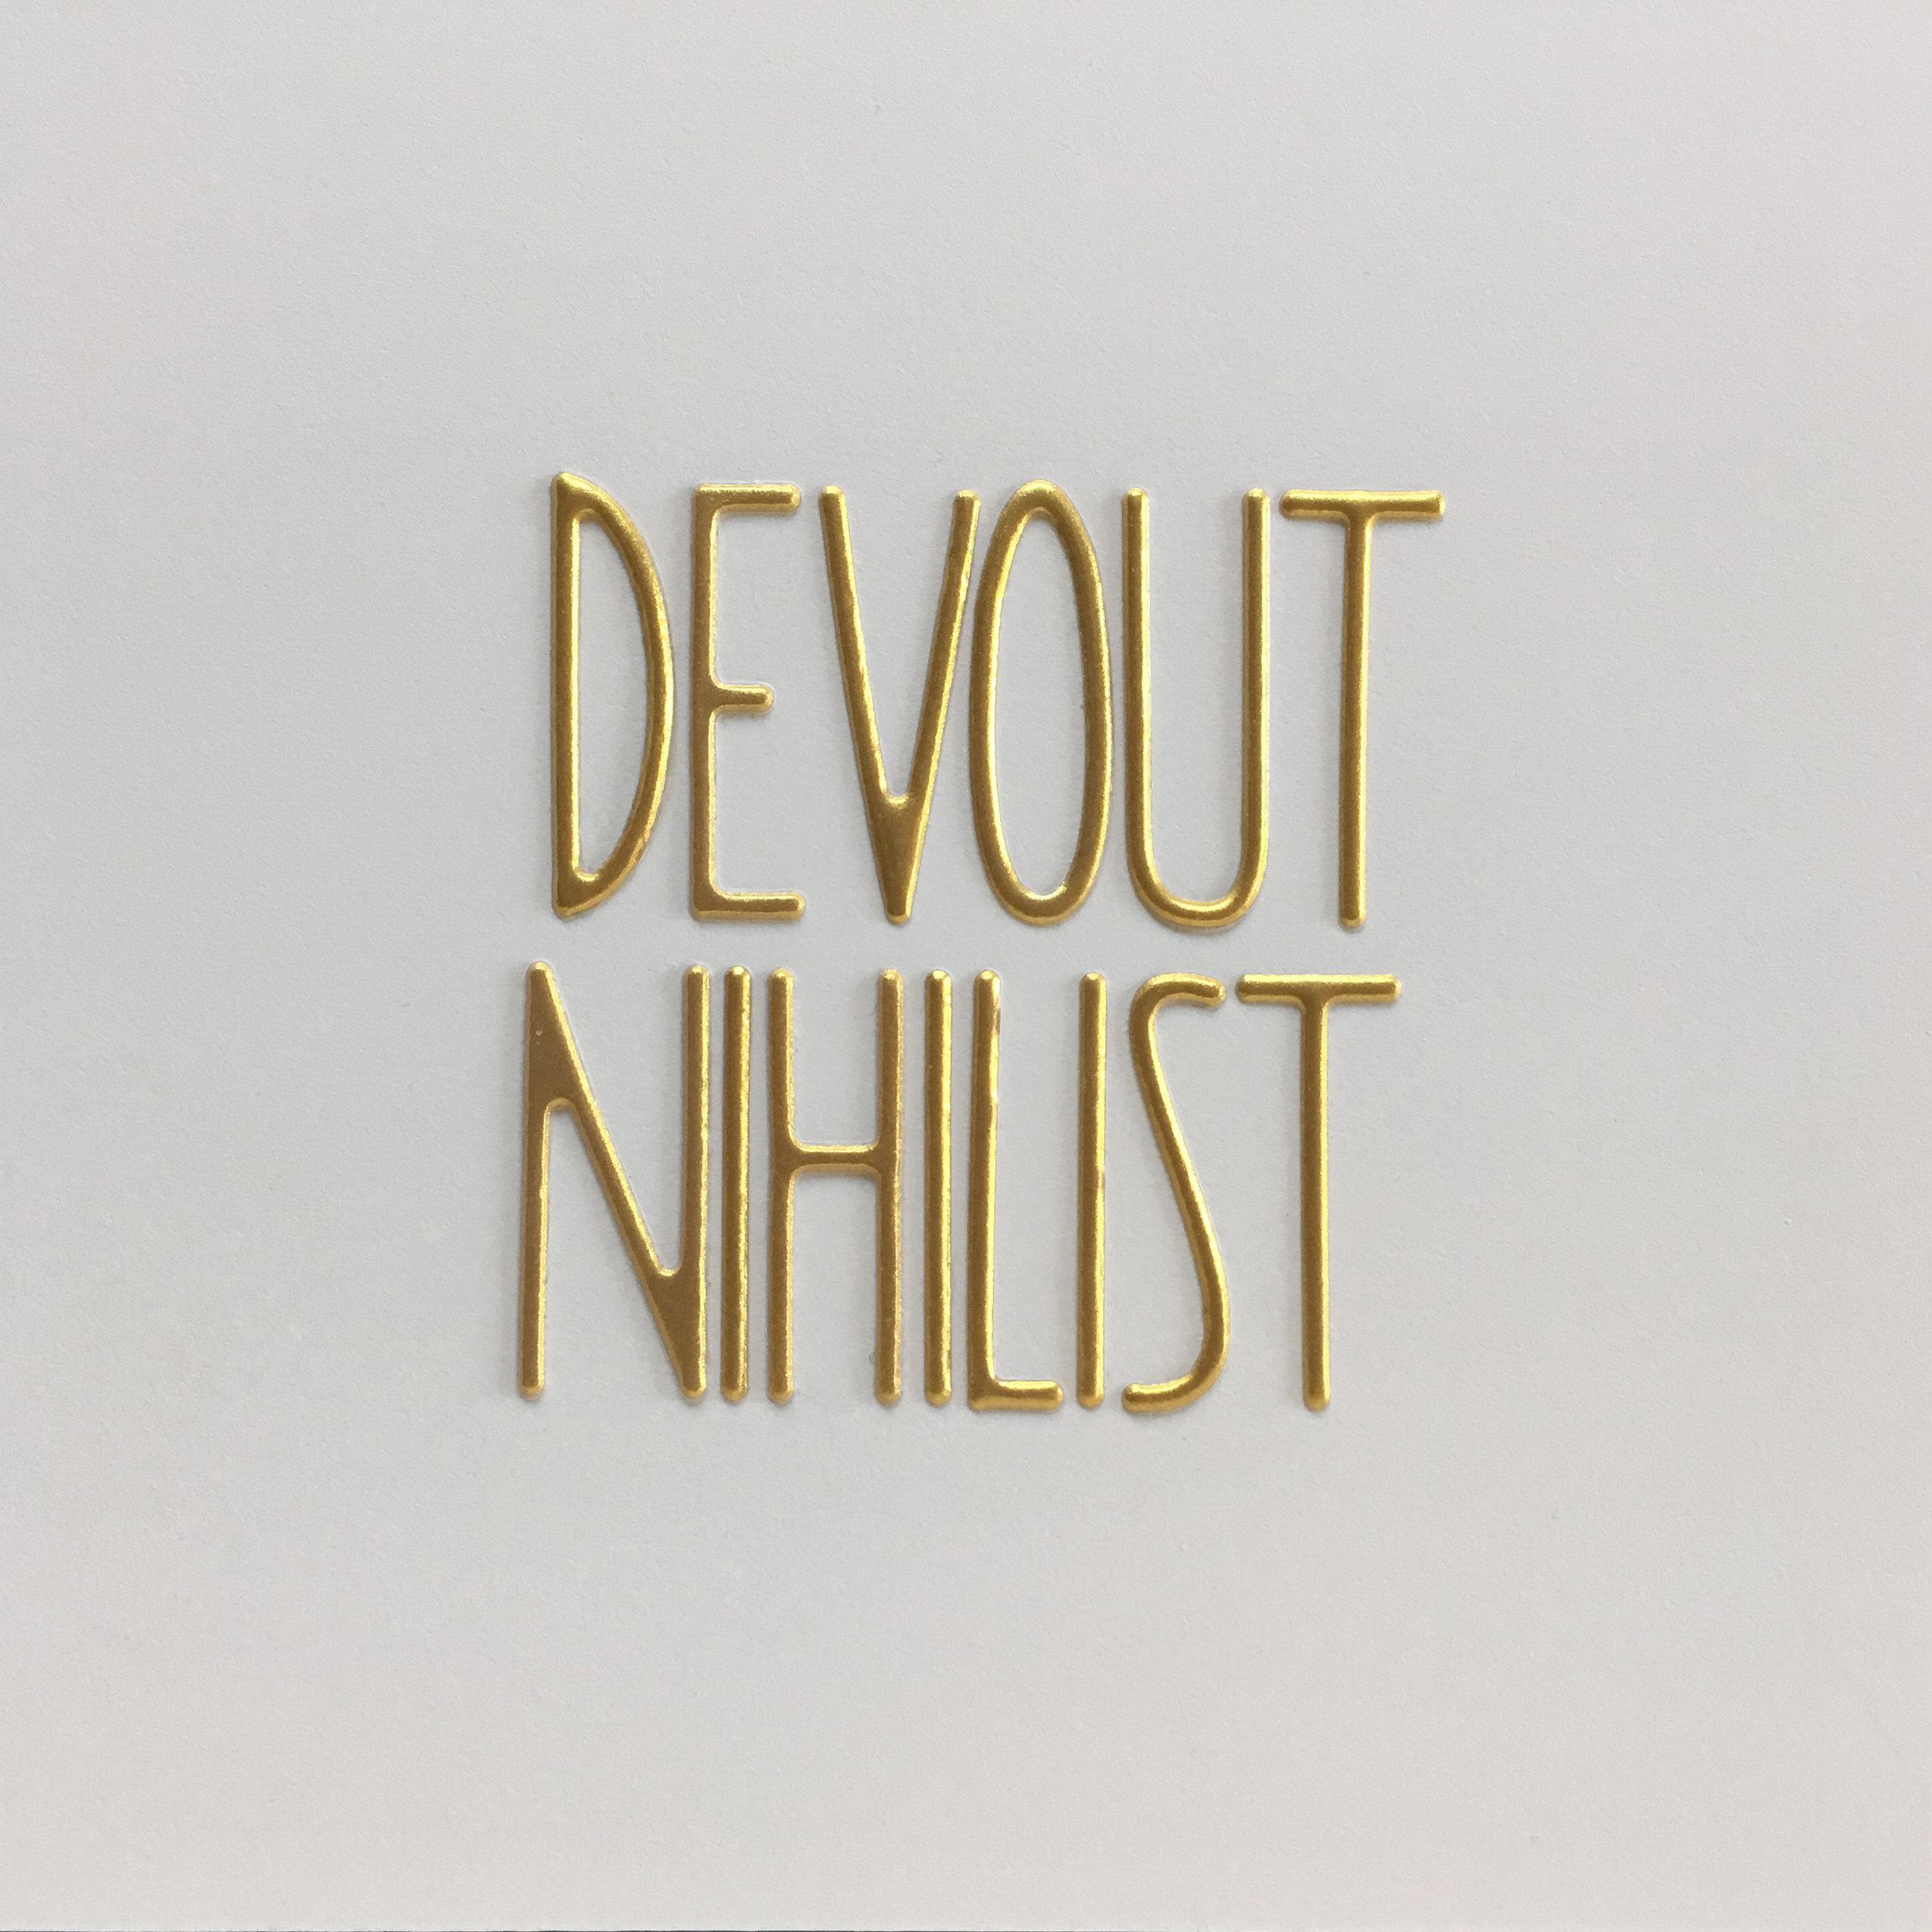 devout nihilist.jpg